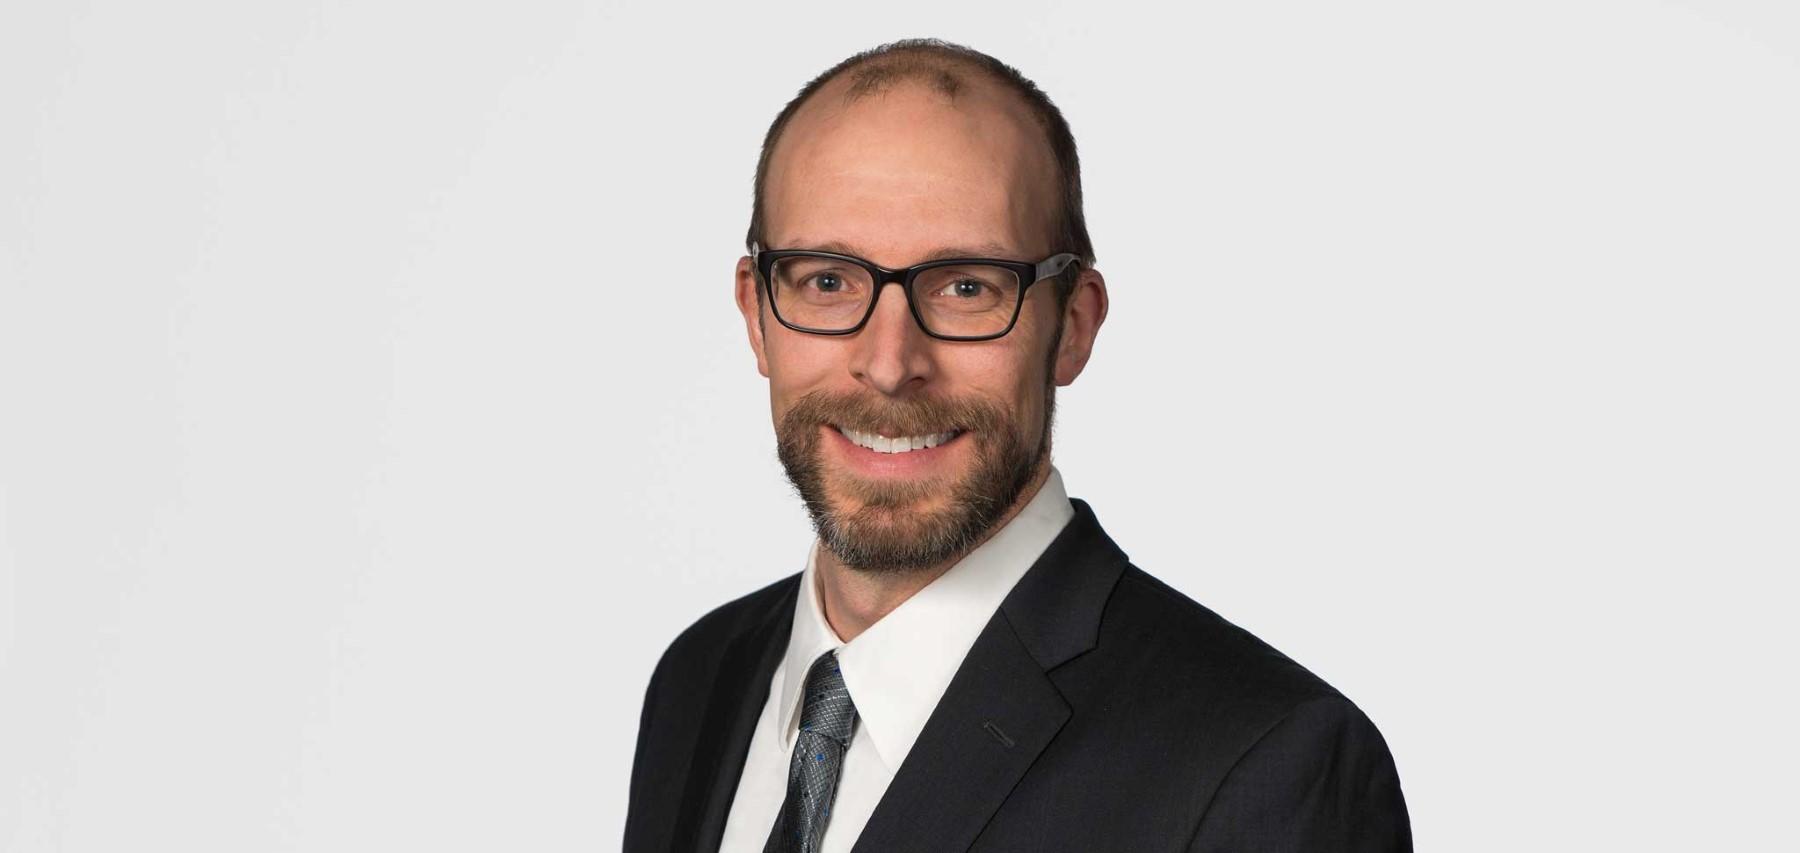 Cory Zurell